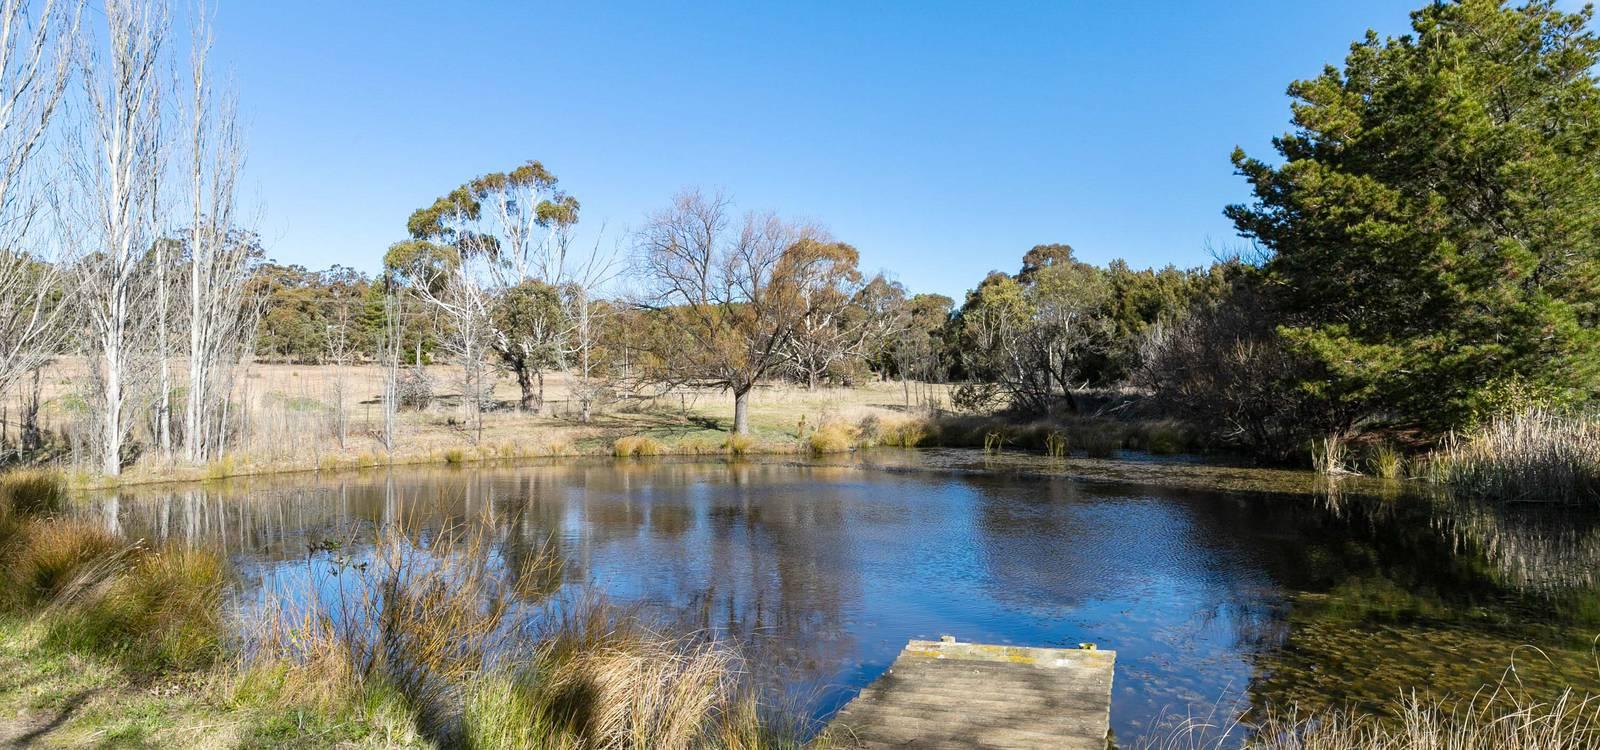 134 BIngley Way WAMBOIN, NSW 2620 - photo 1